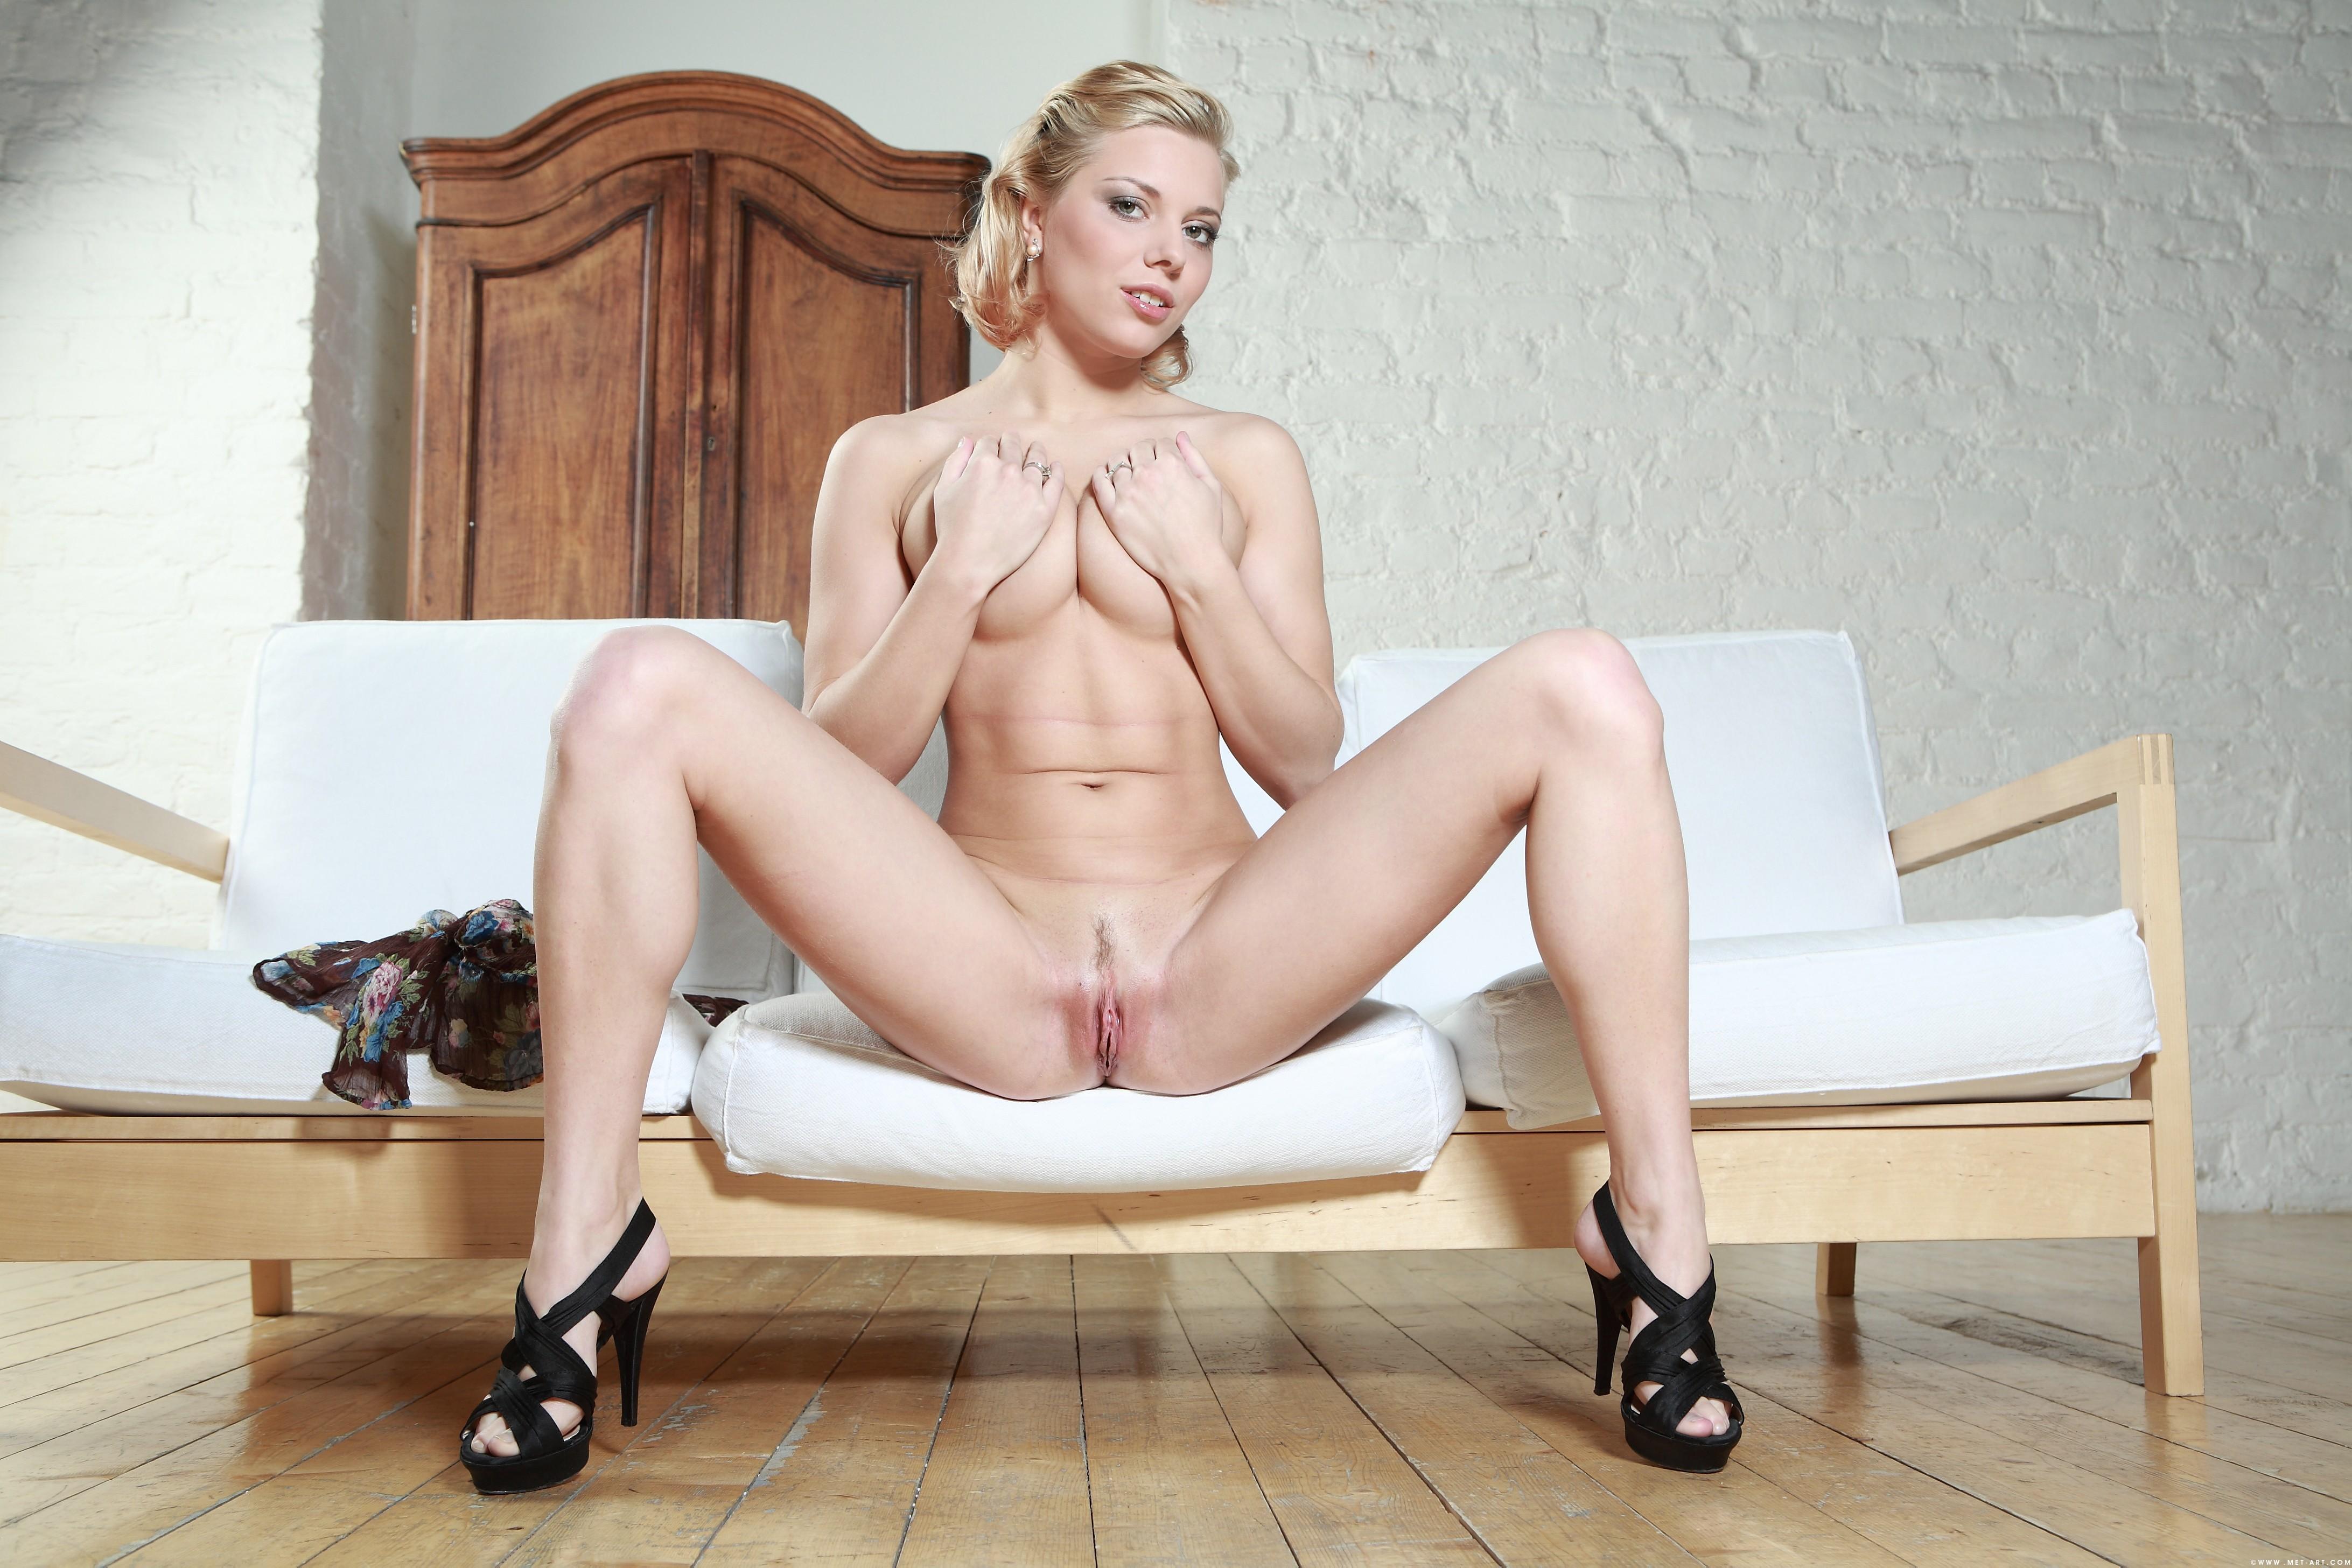 blondinka-razdvinula-nogi-porno